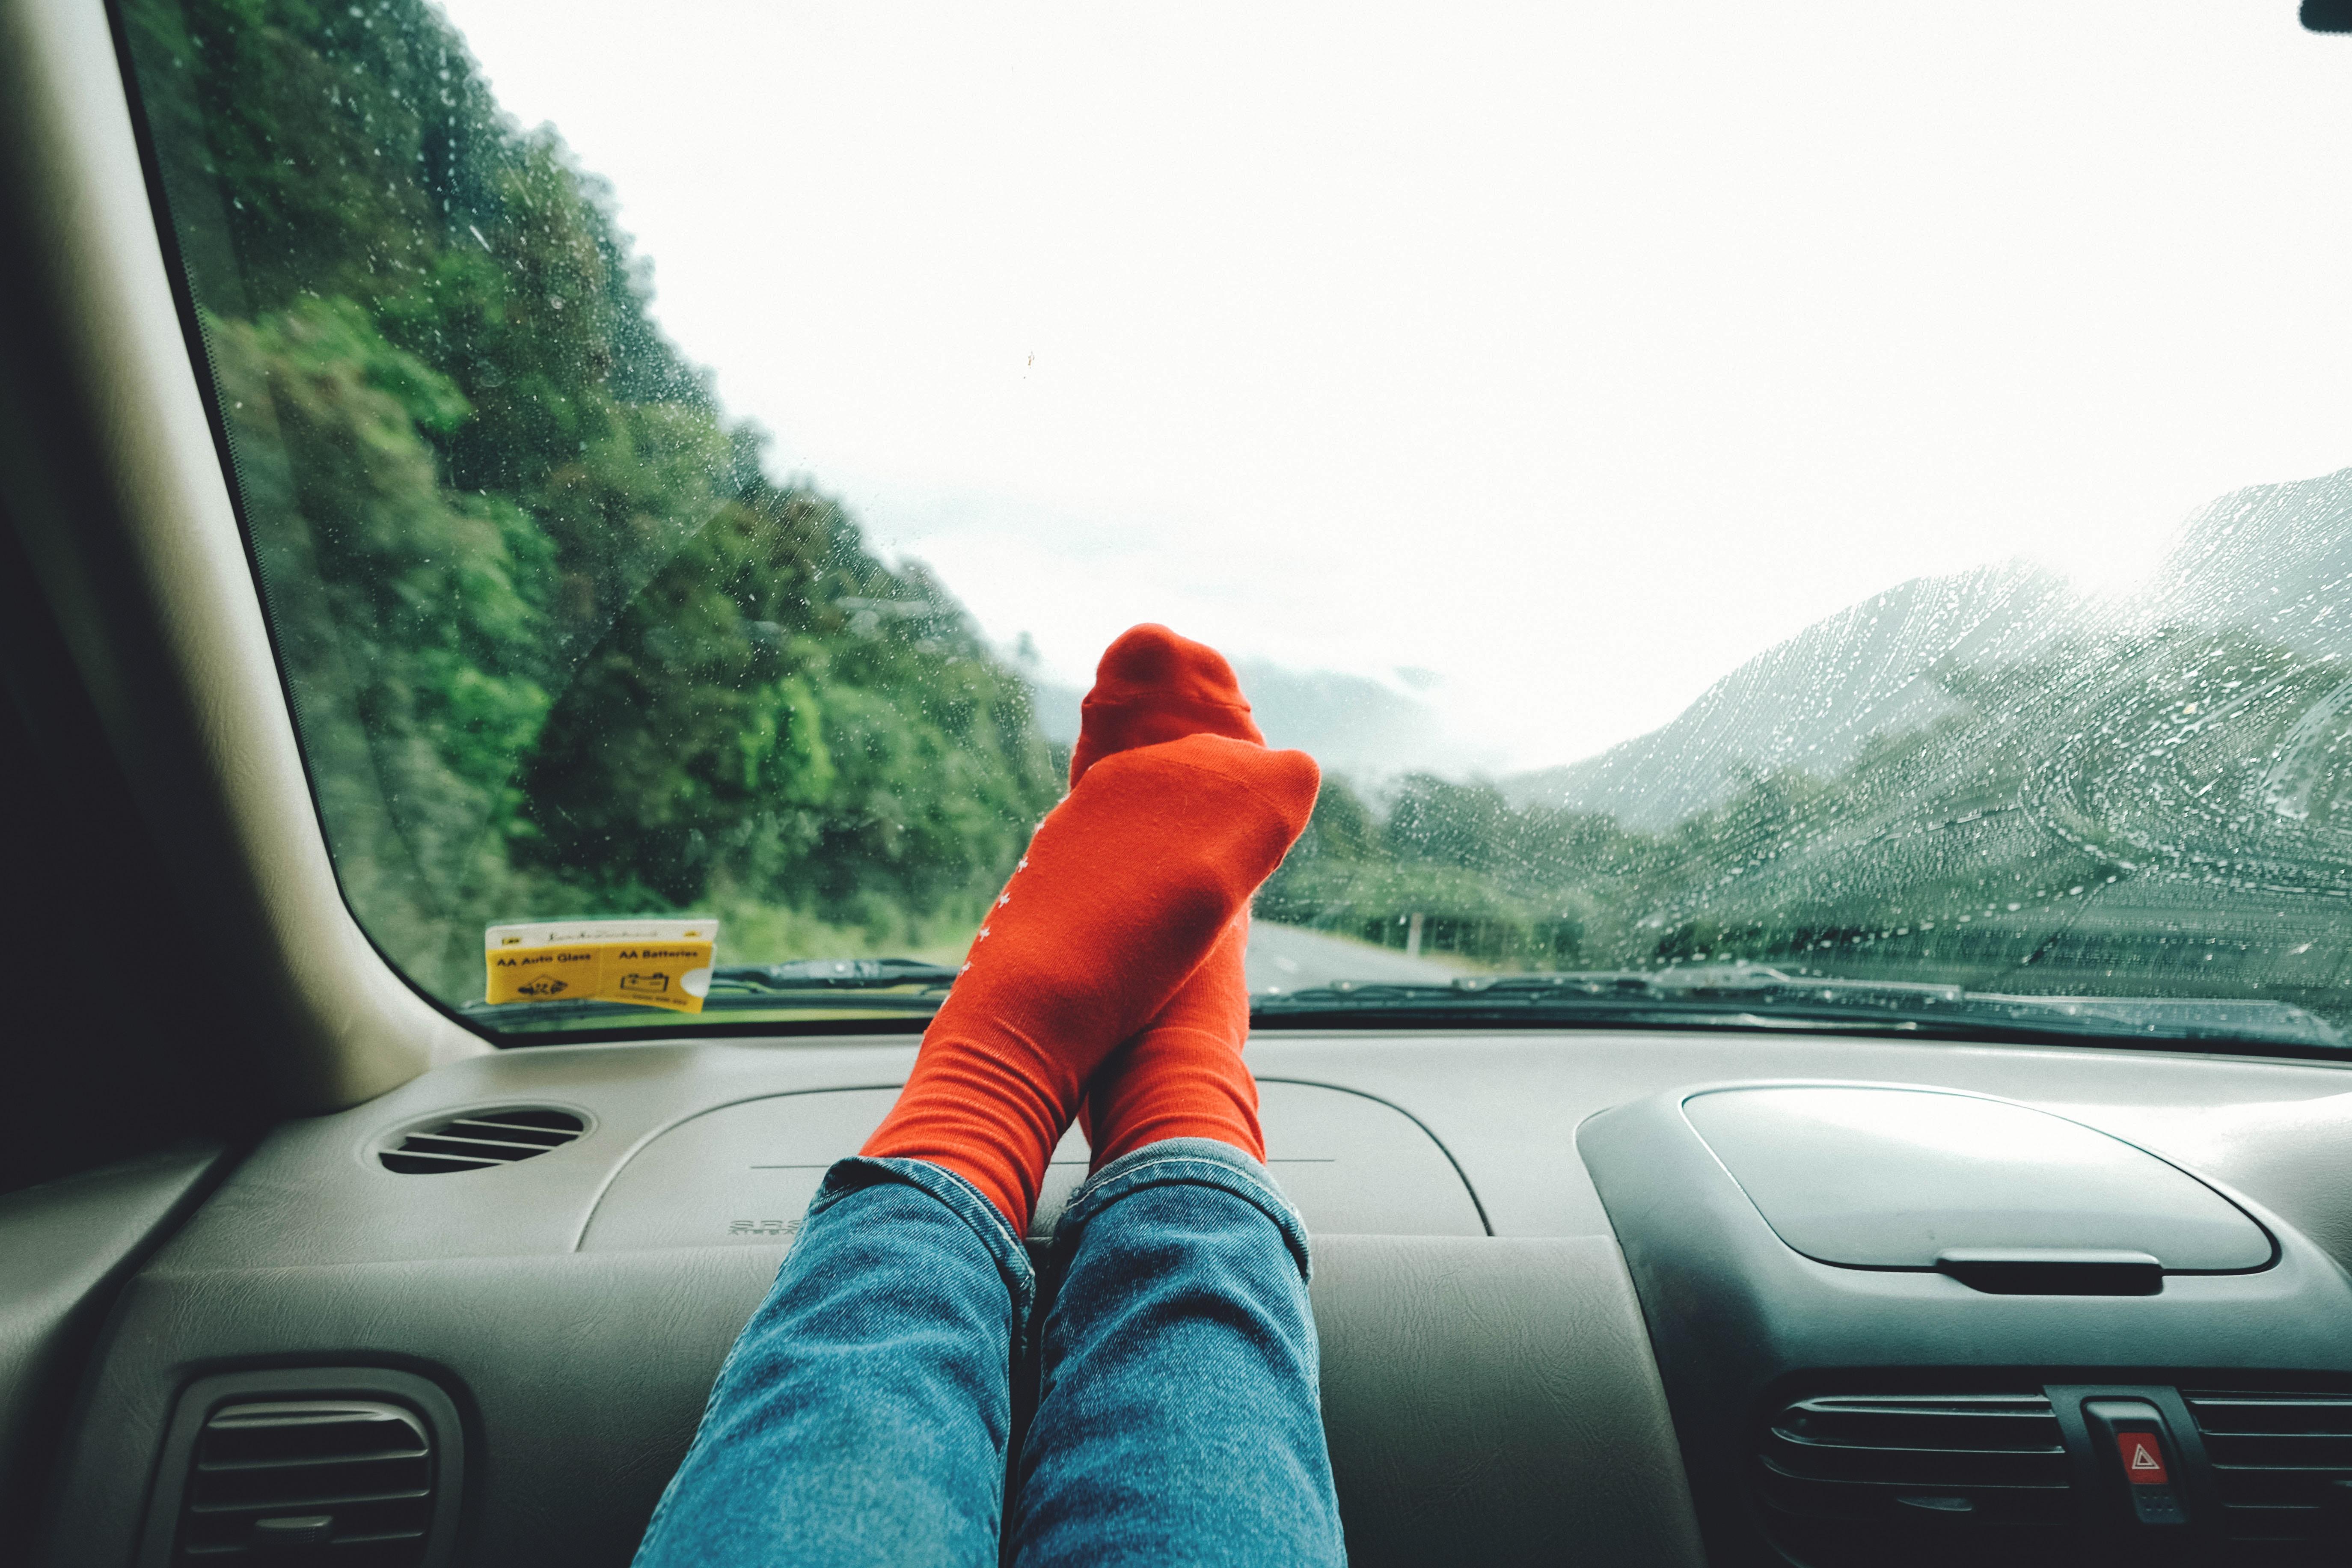 person wearing red socks near mountain